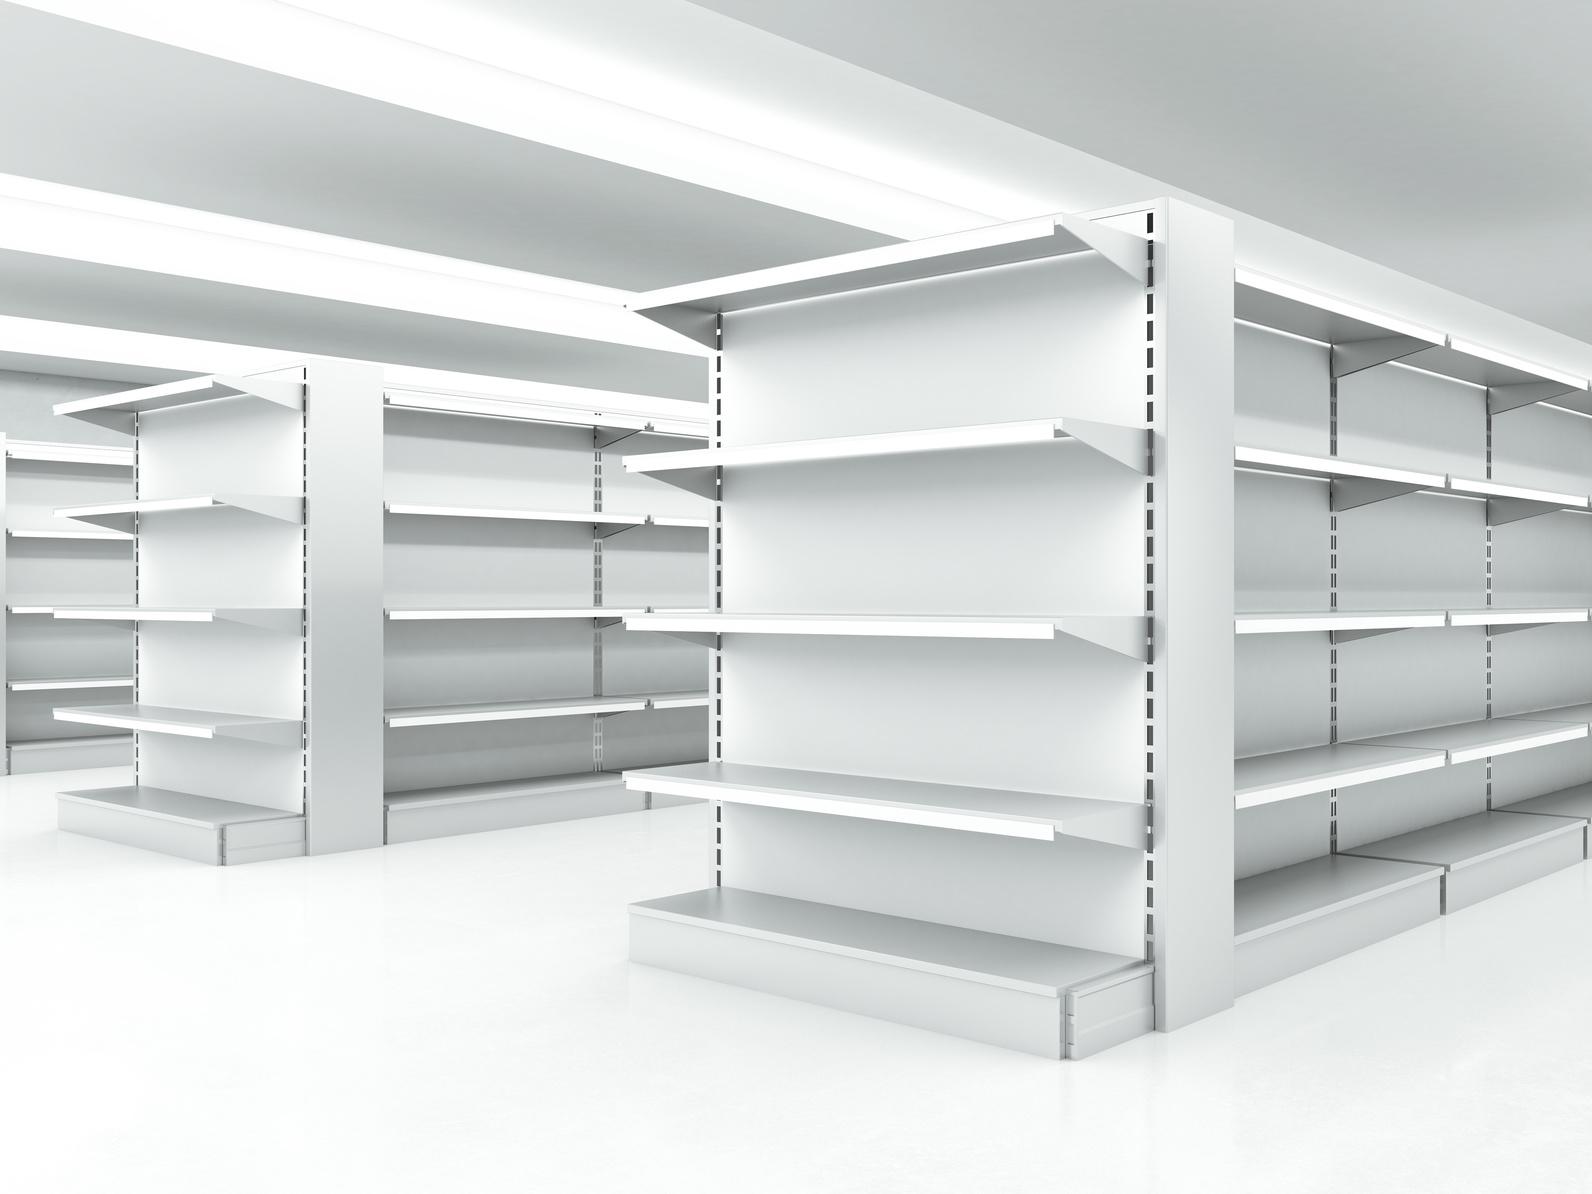 white clean shelves in market. 3d render